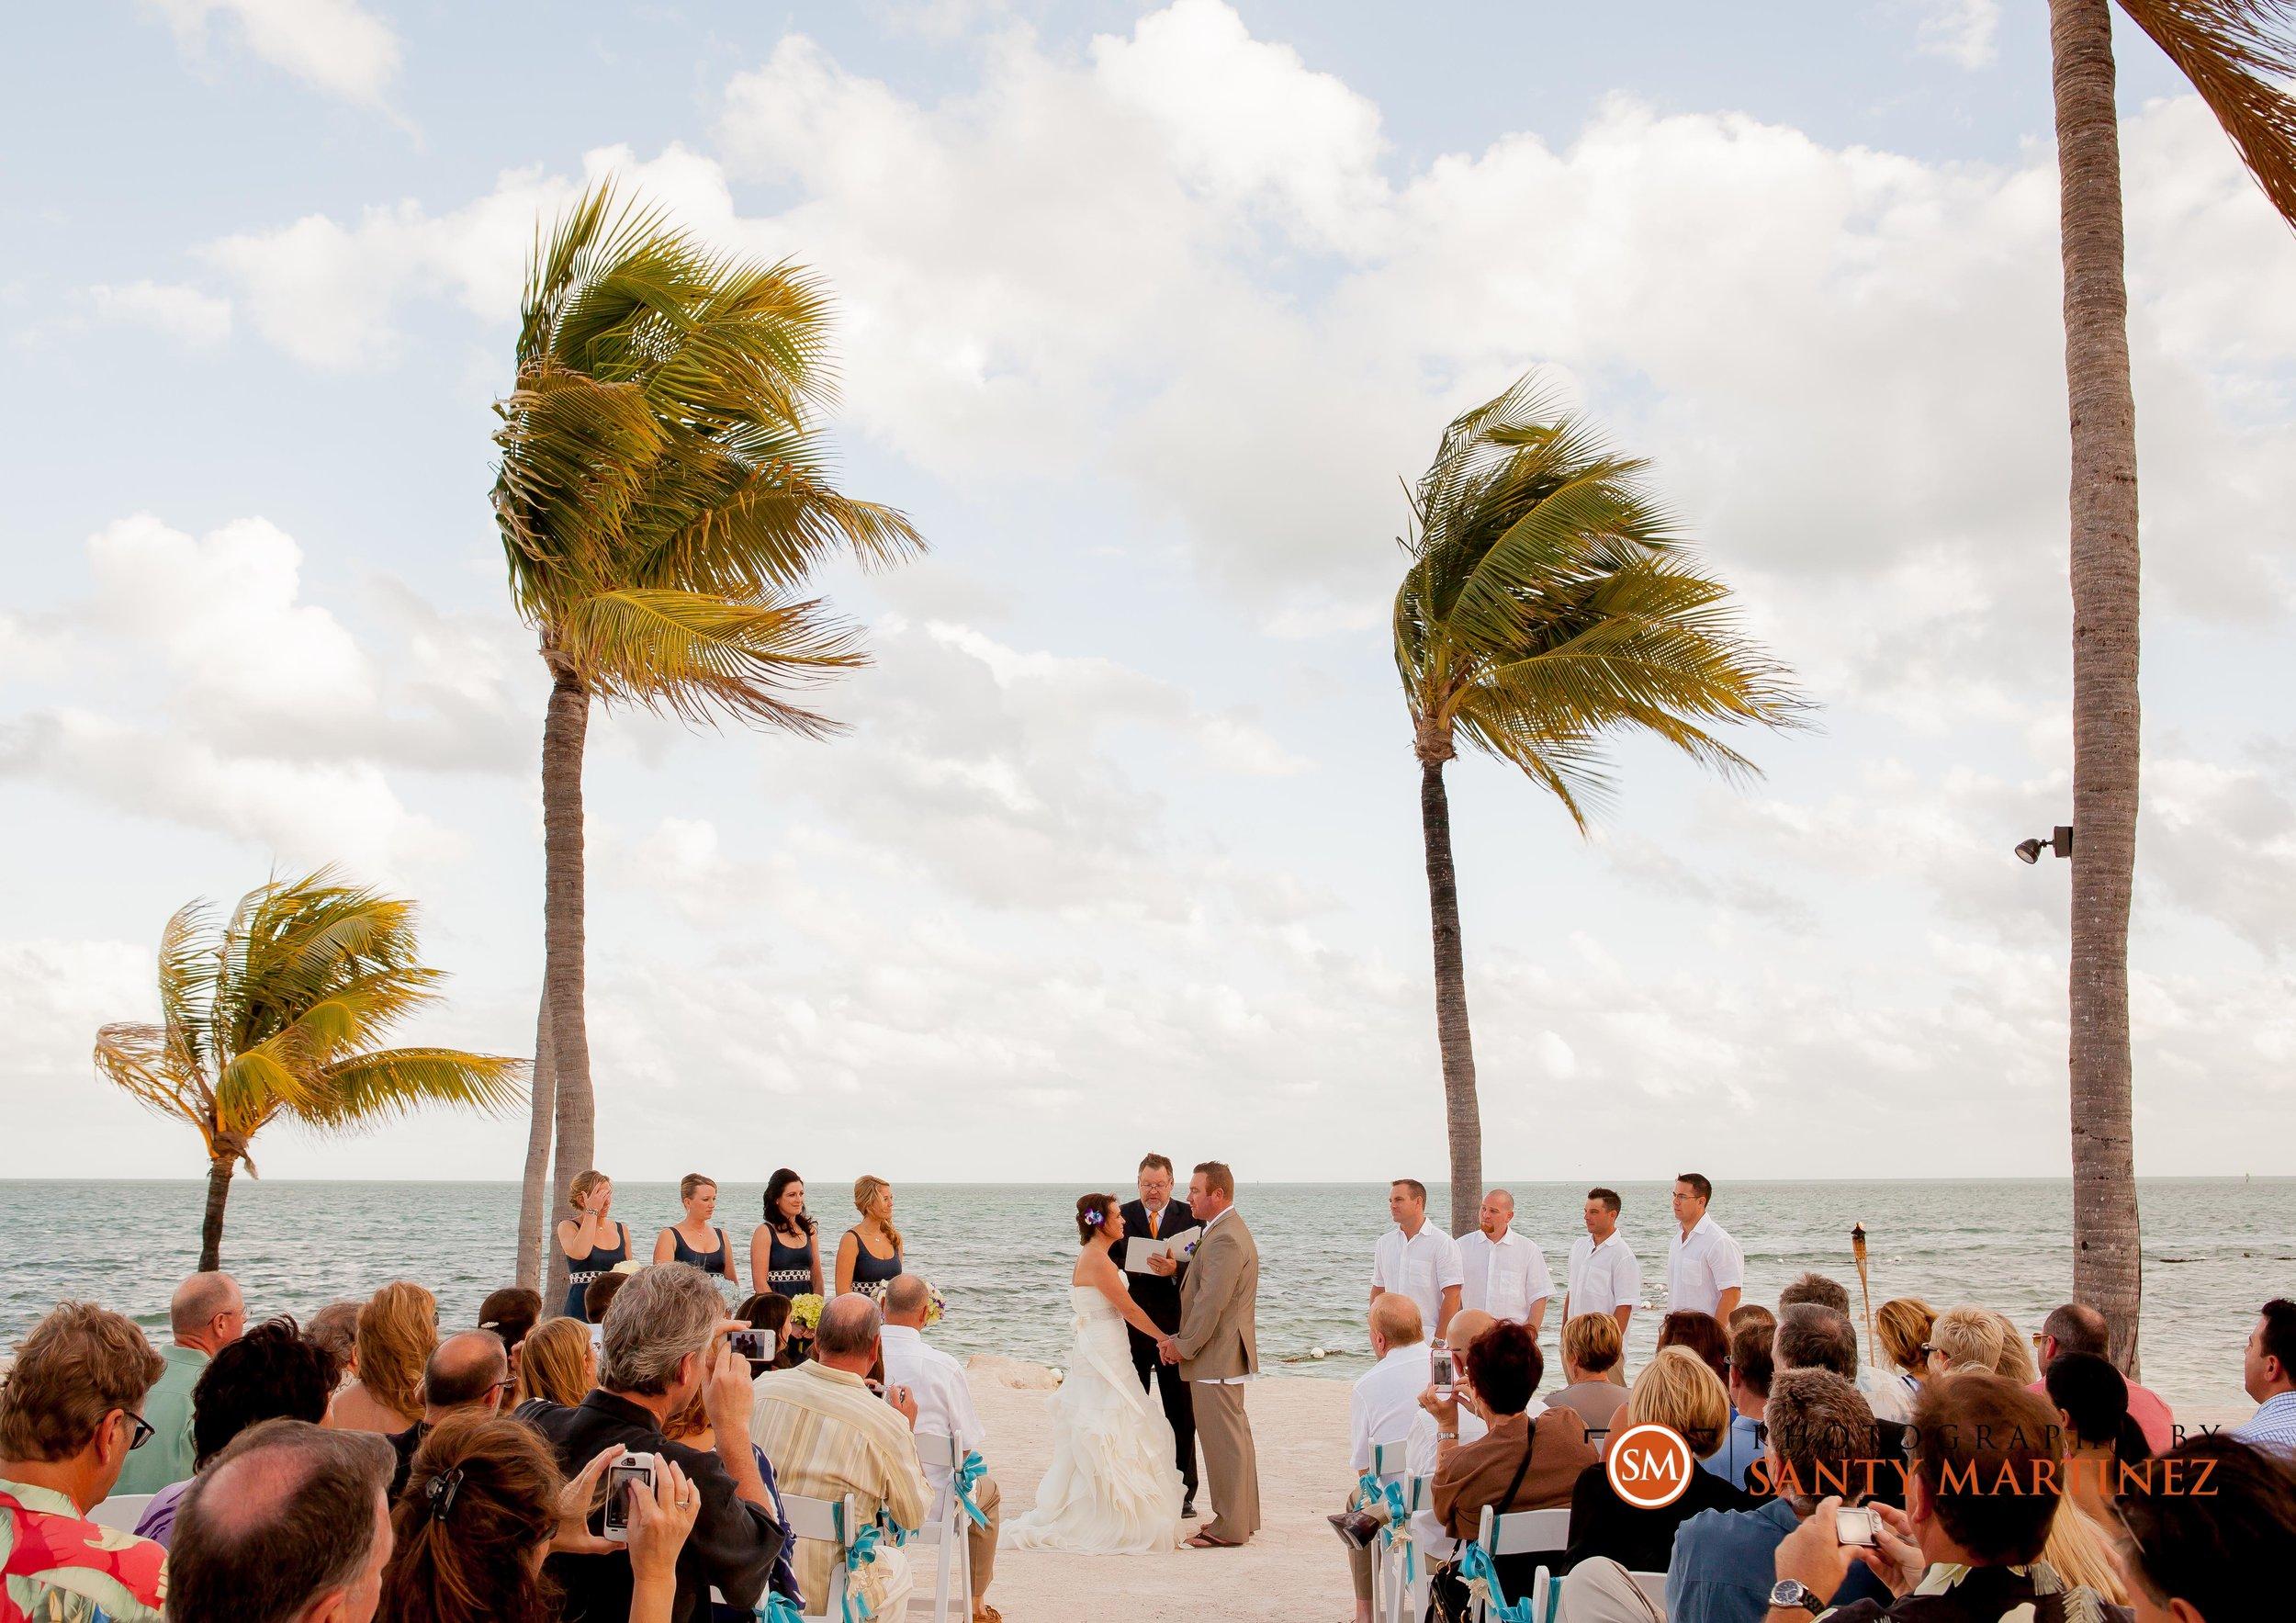 Photography by Santy Martinez - Miami Wedding Photographer-032.jpg